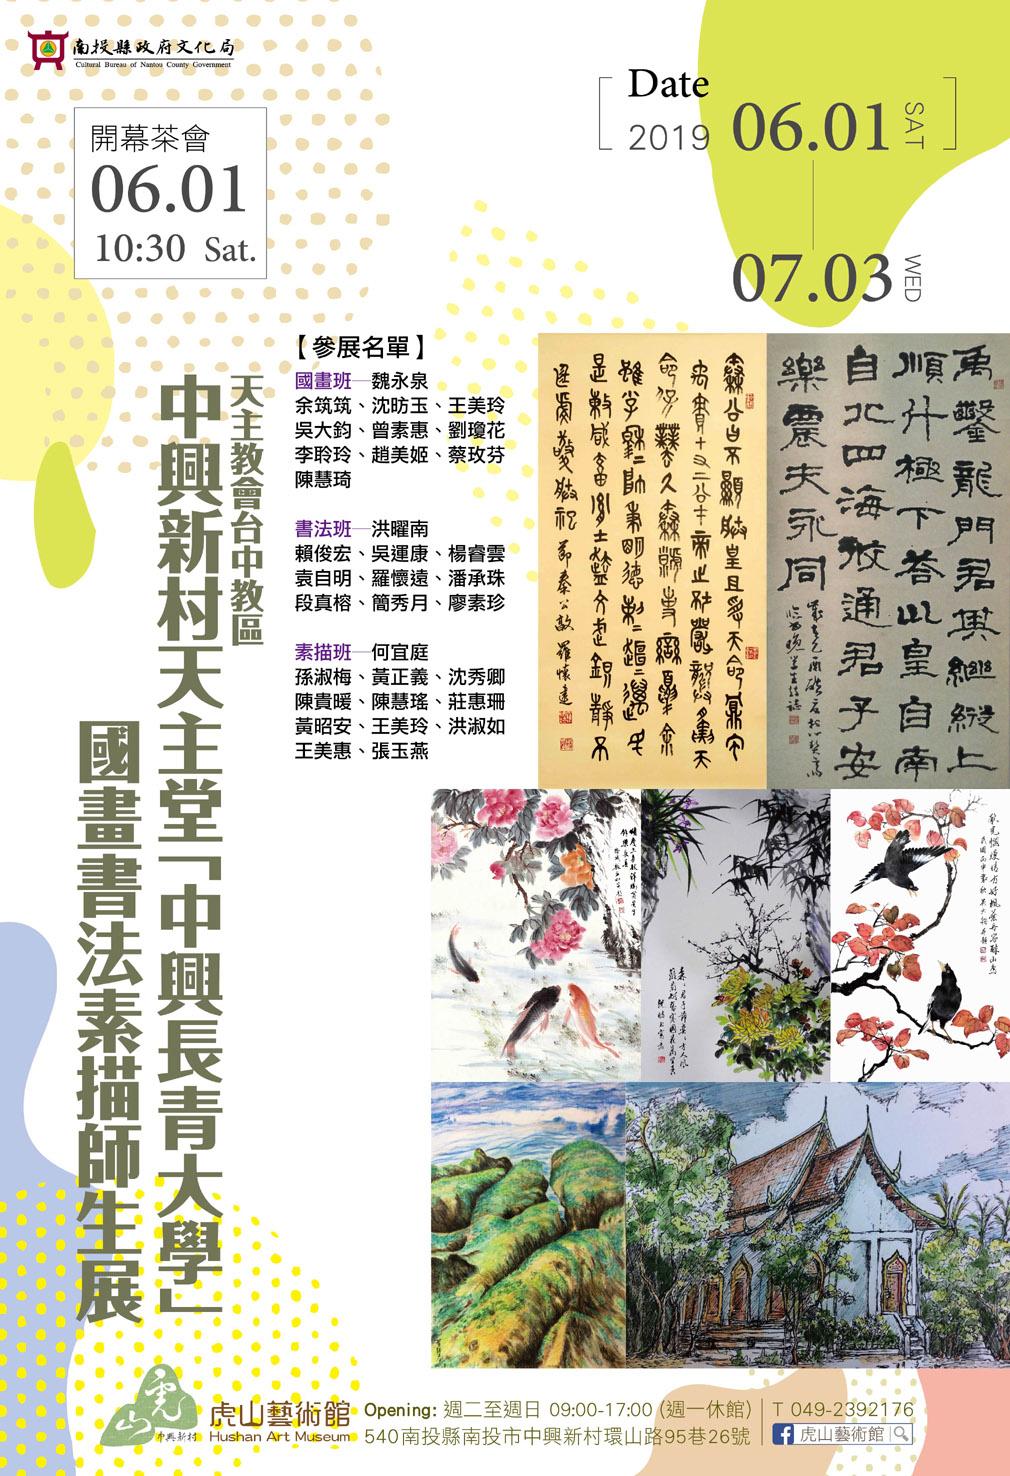 Image-中興長青大學.jpg